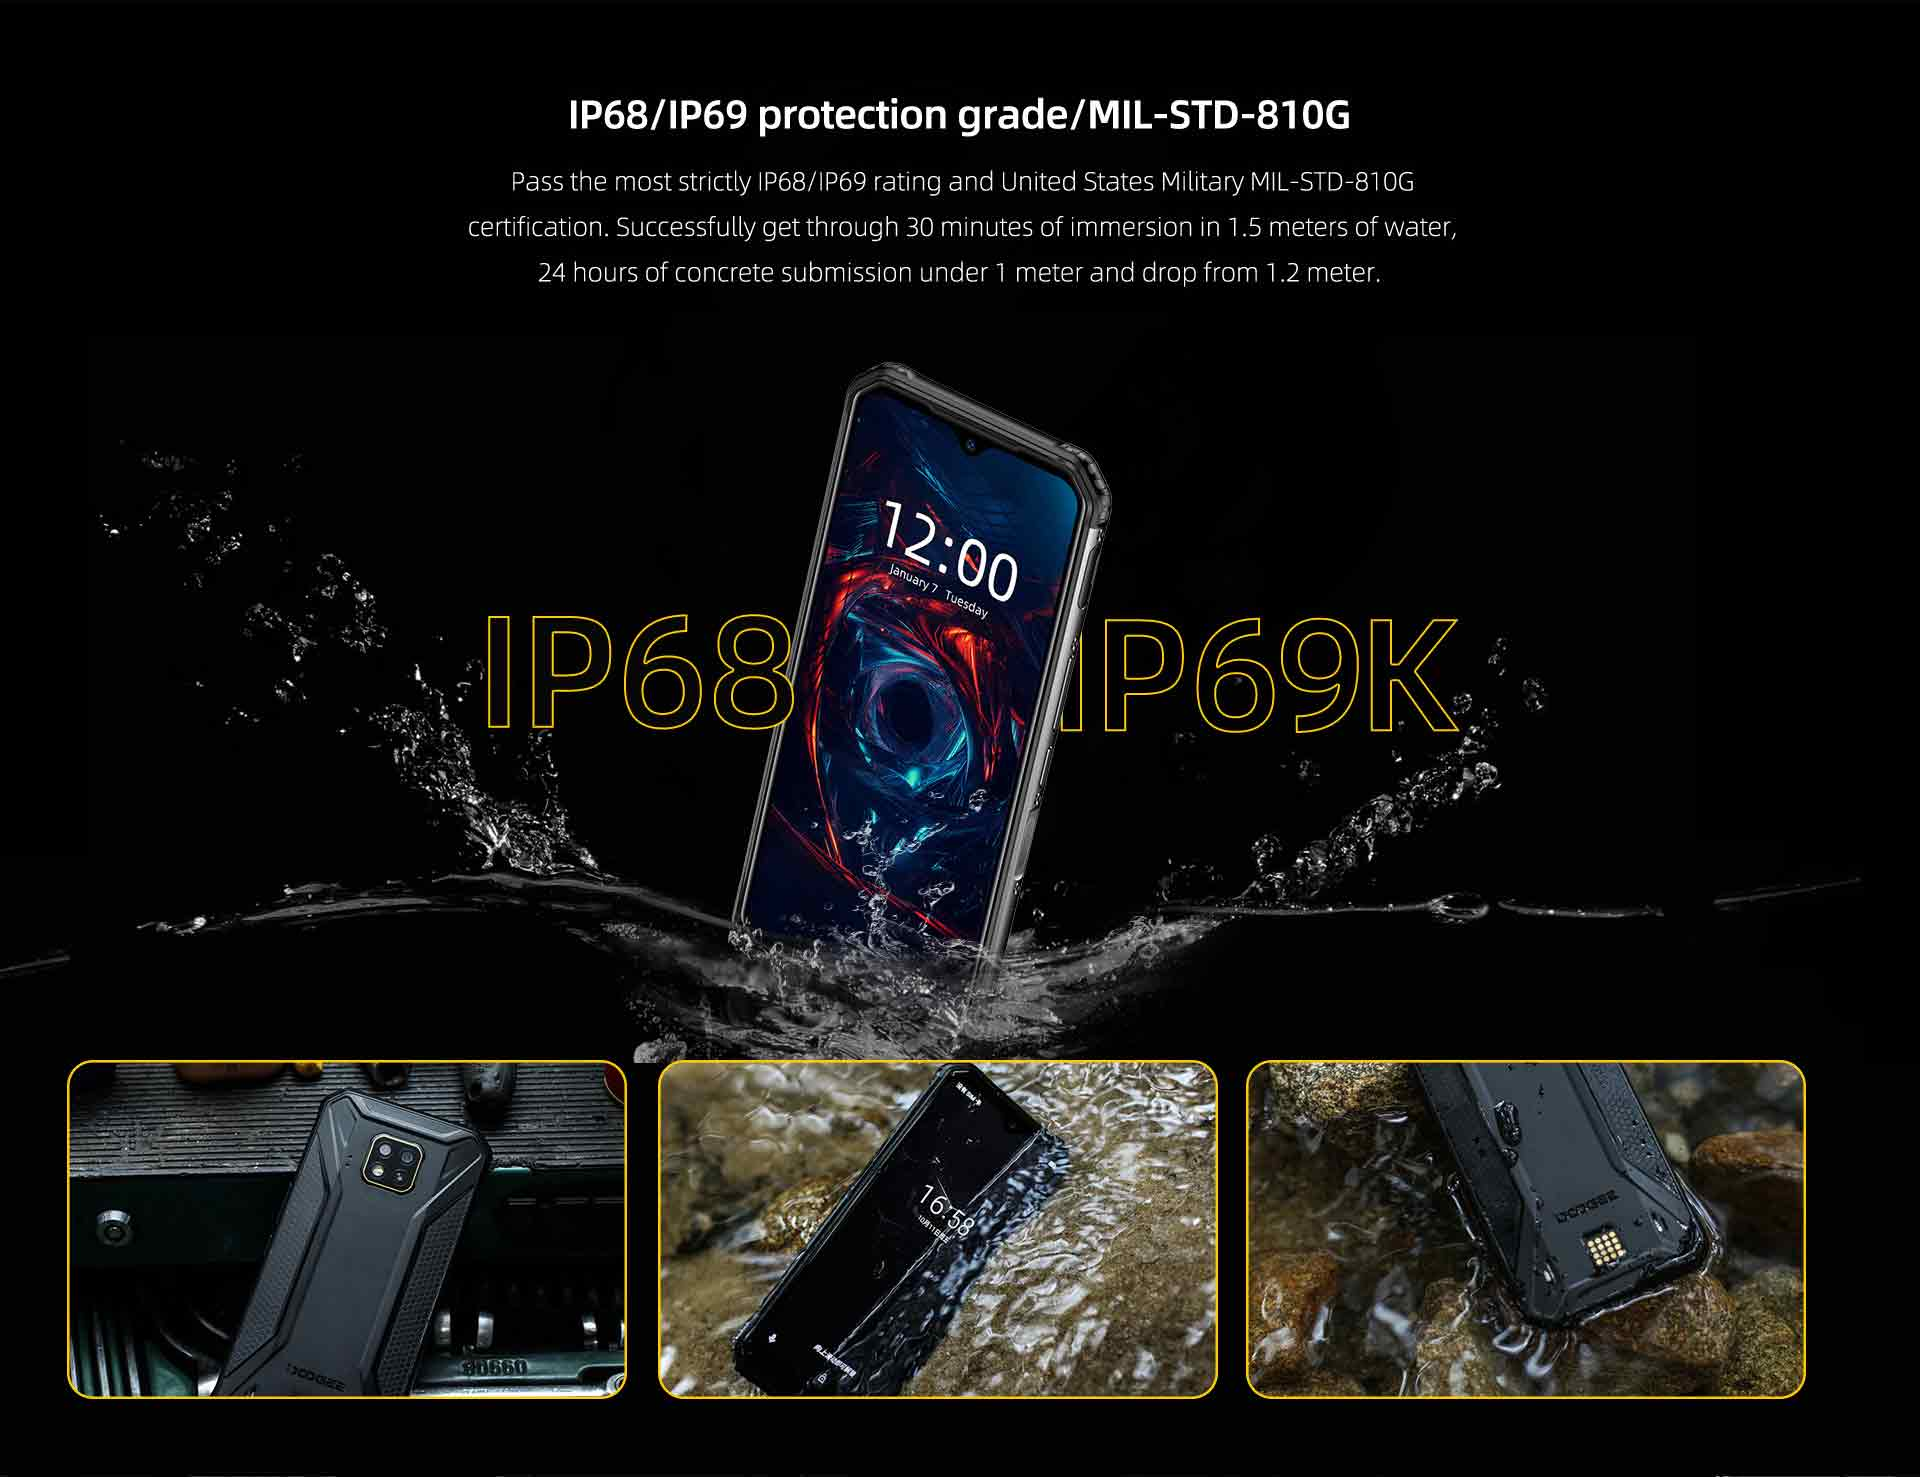 DOOGEE S95 MODULAR phone